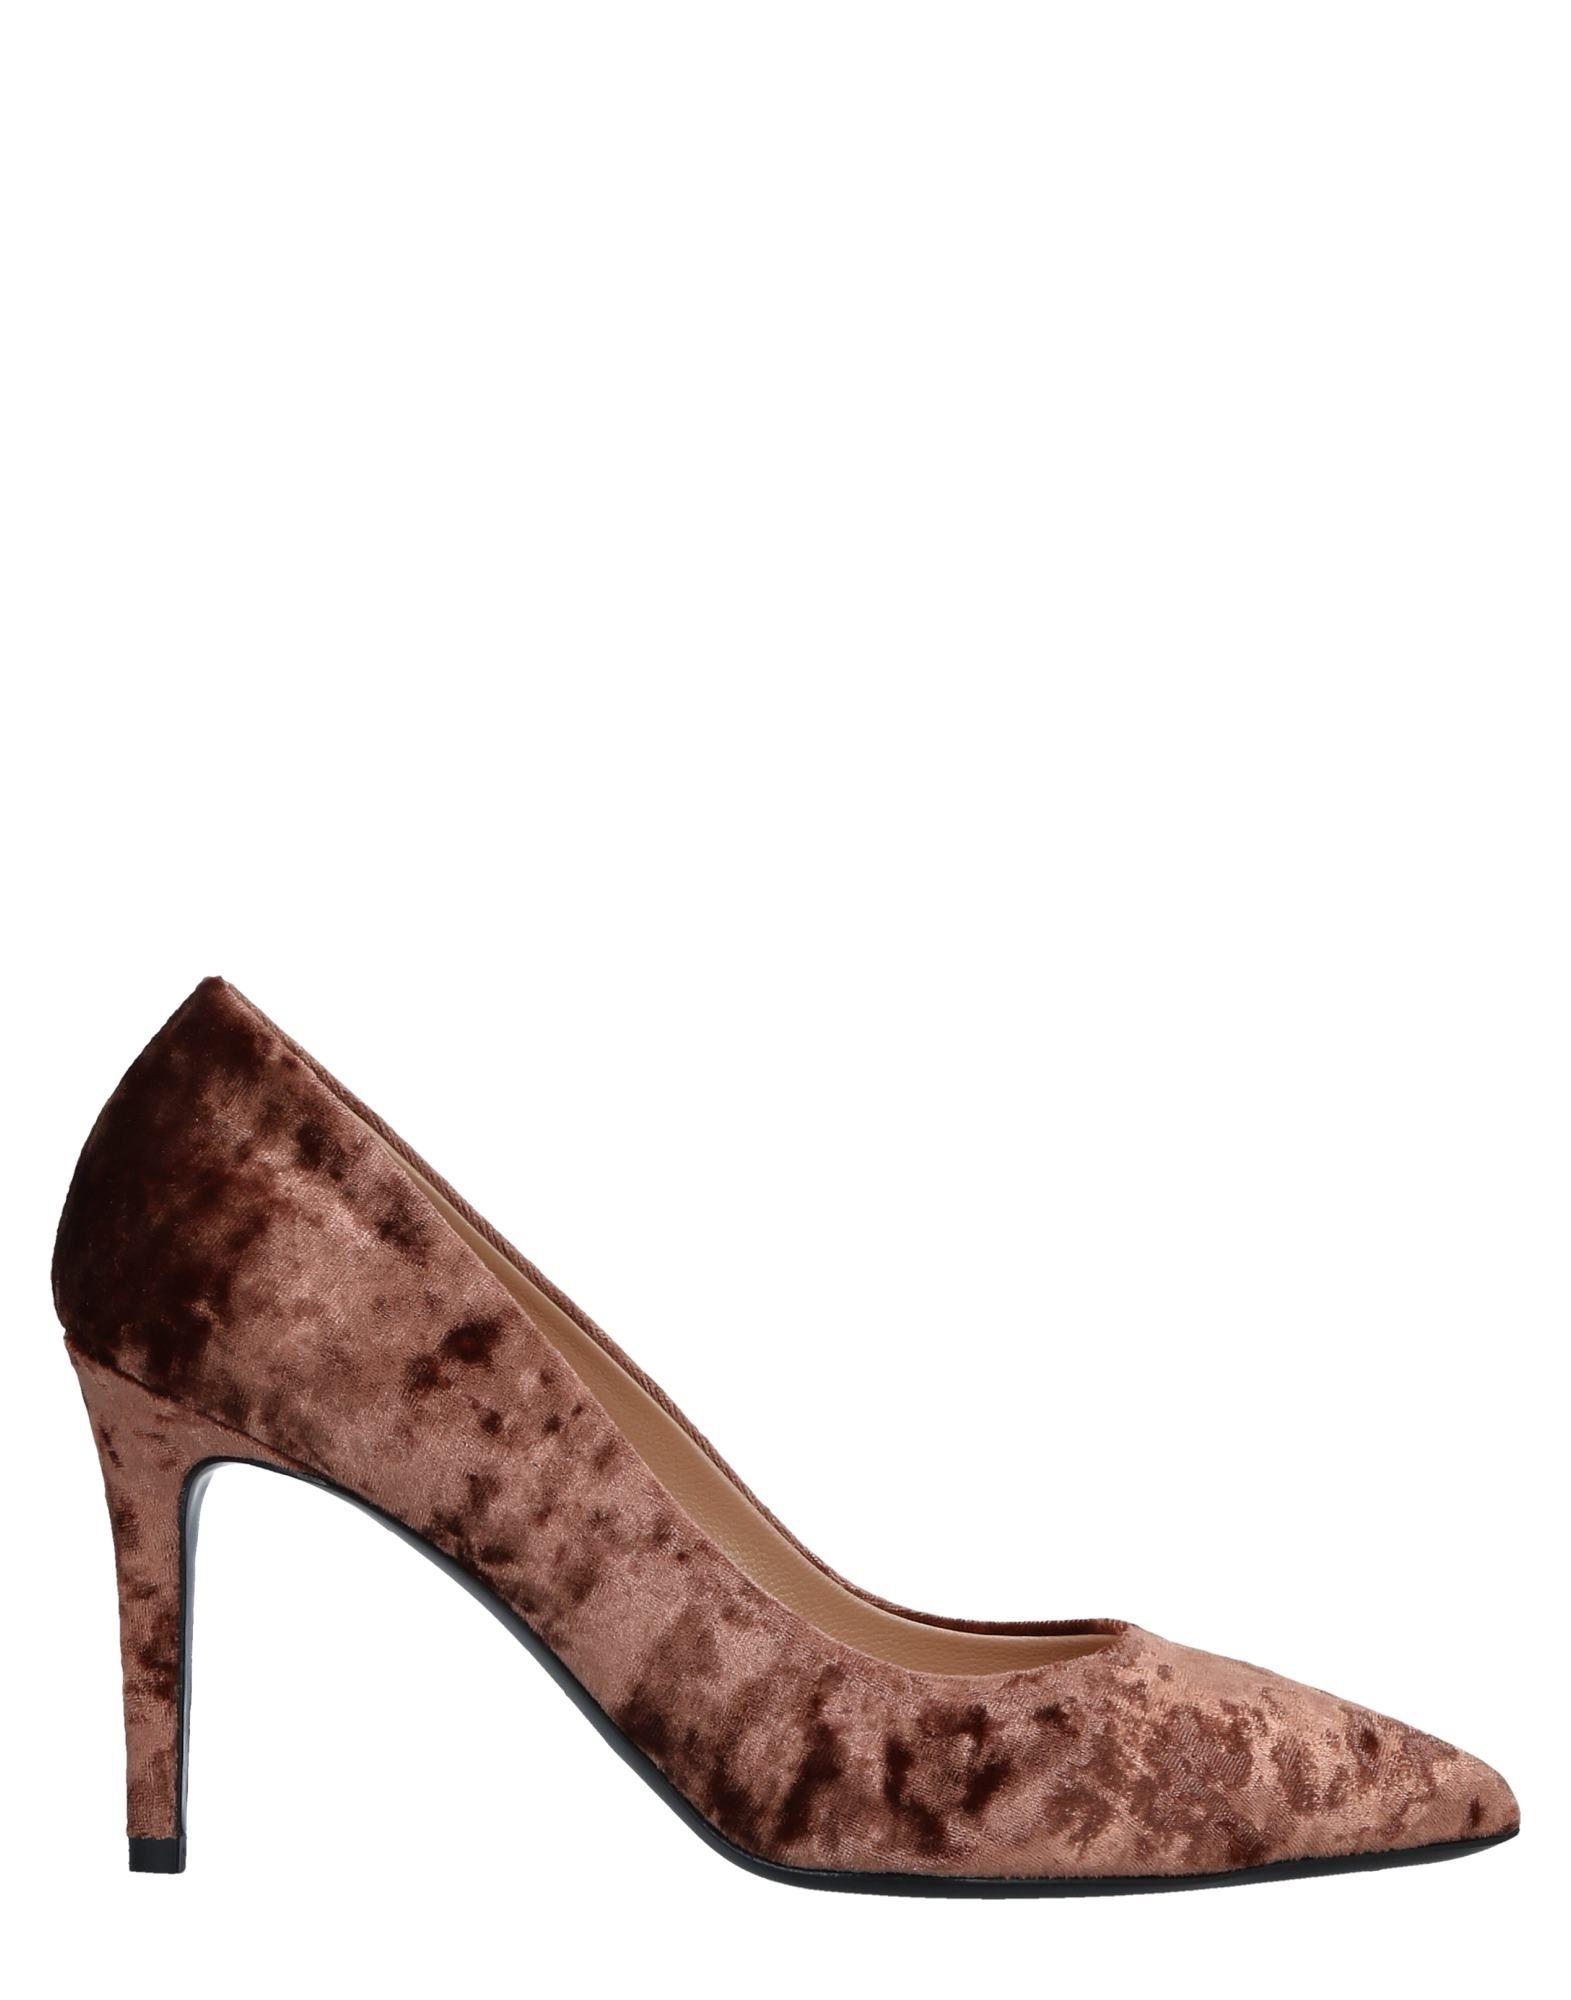 Marco Marco Marco Barbabella Pumps Damen  11515991VH Beliebte Schuhe 616845